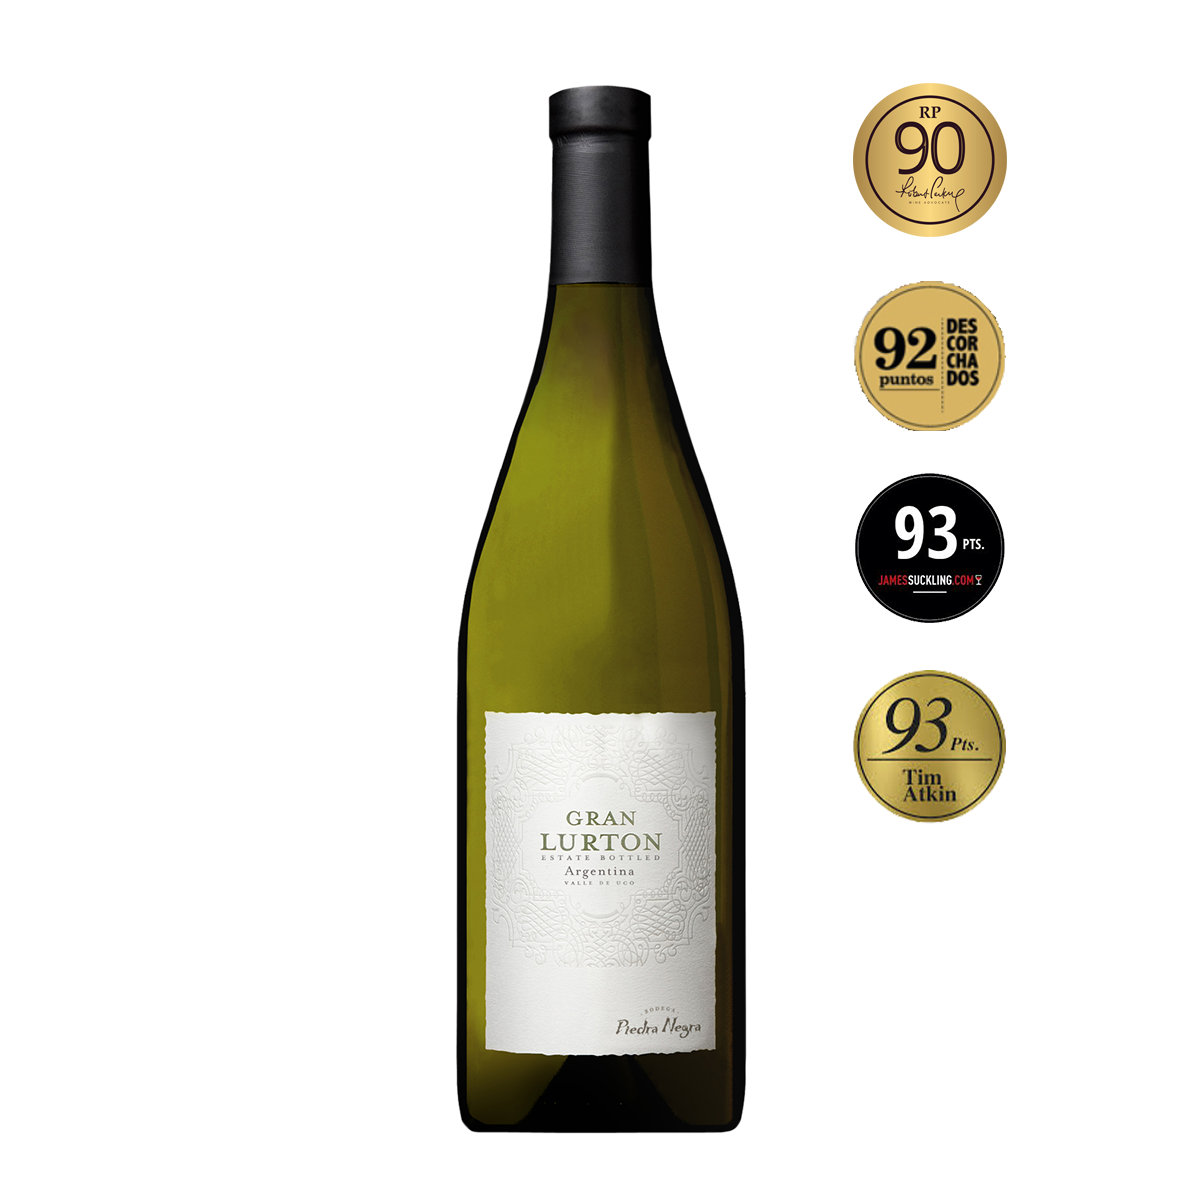 ARL2301 阿根廷門多薩魯頓黑寶石莊園2015大魯頓干白葡萄酒 Gran Lurton Blanco, Valle de Uco-Mendoza (750ml)